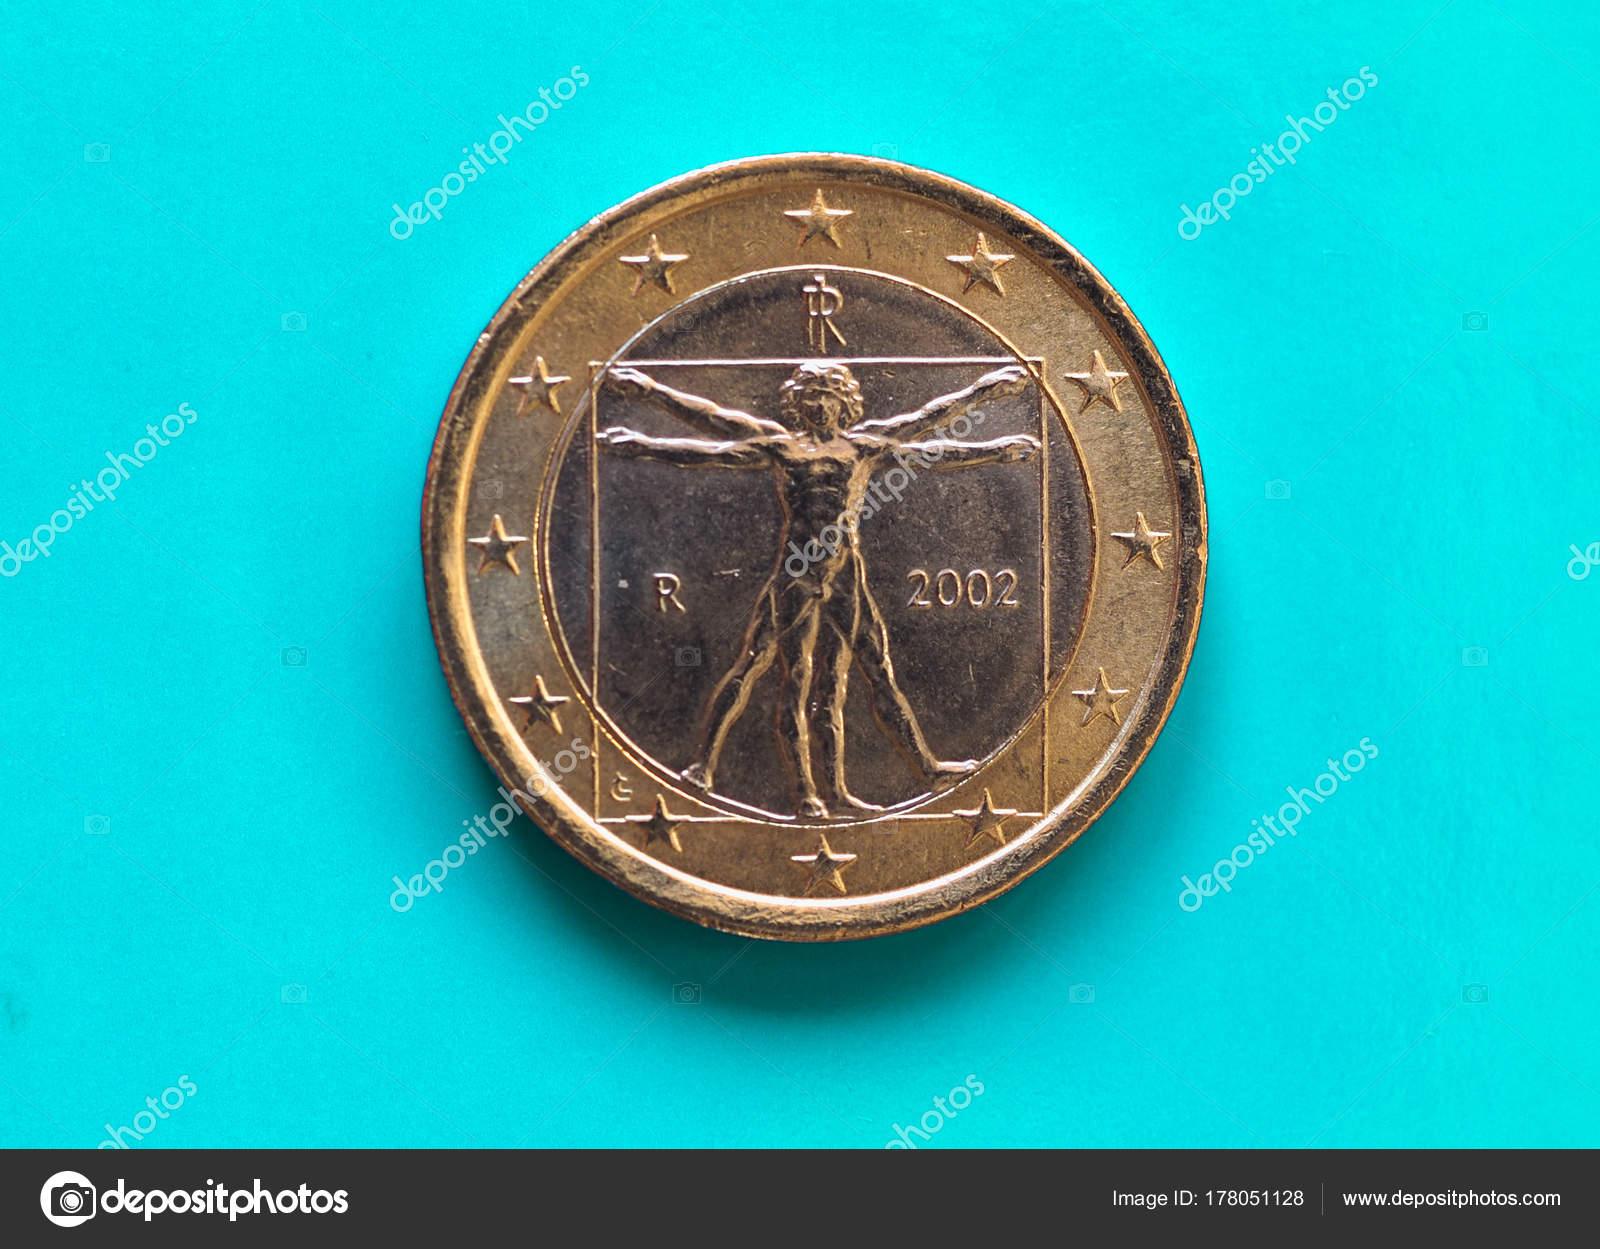 1 Euro Münze Europäische Union Italien über Grün Blau Stockfoto